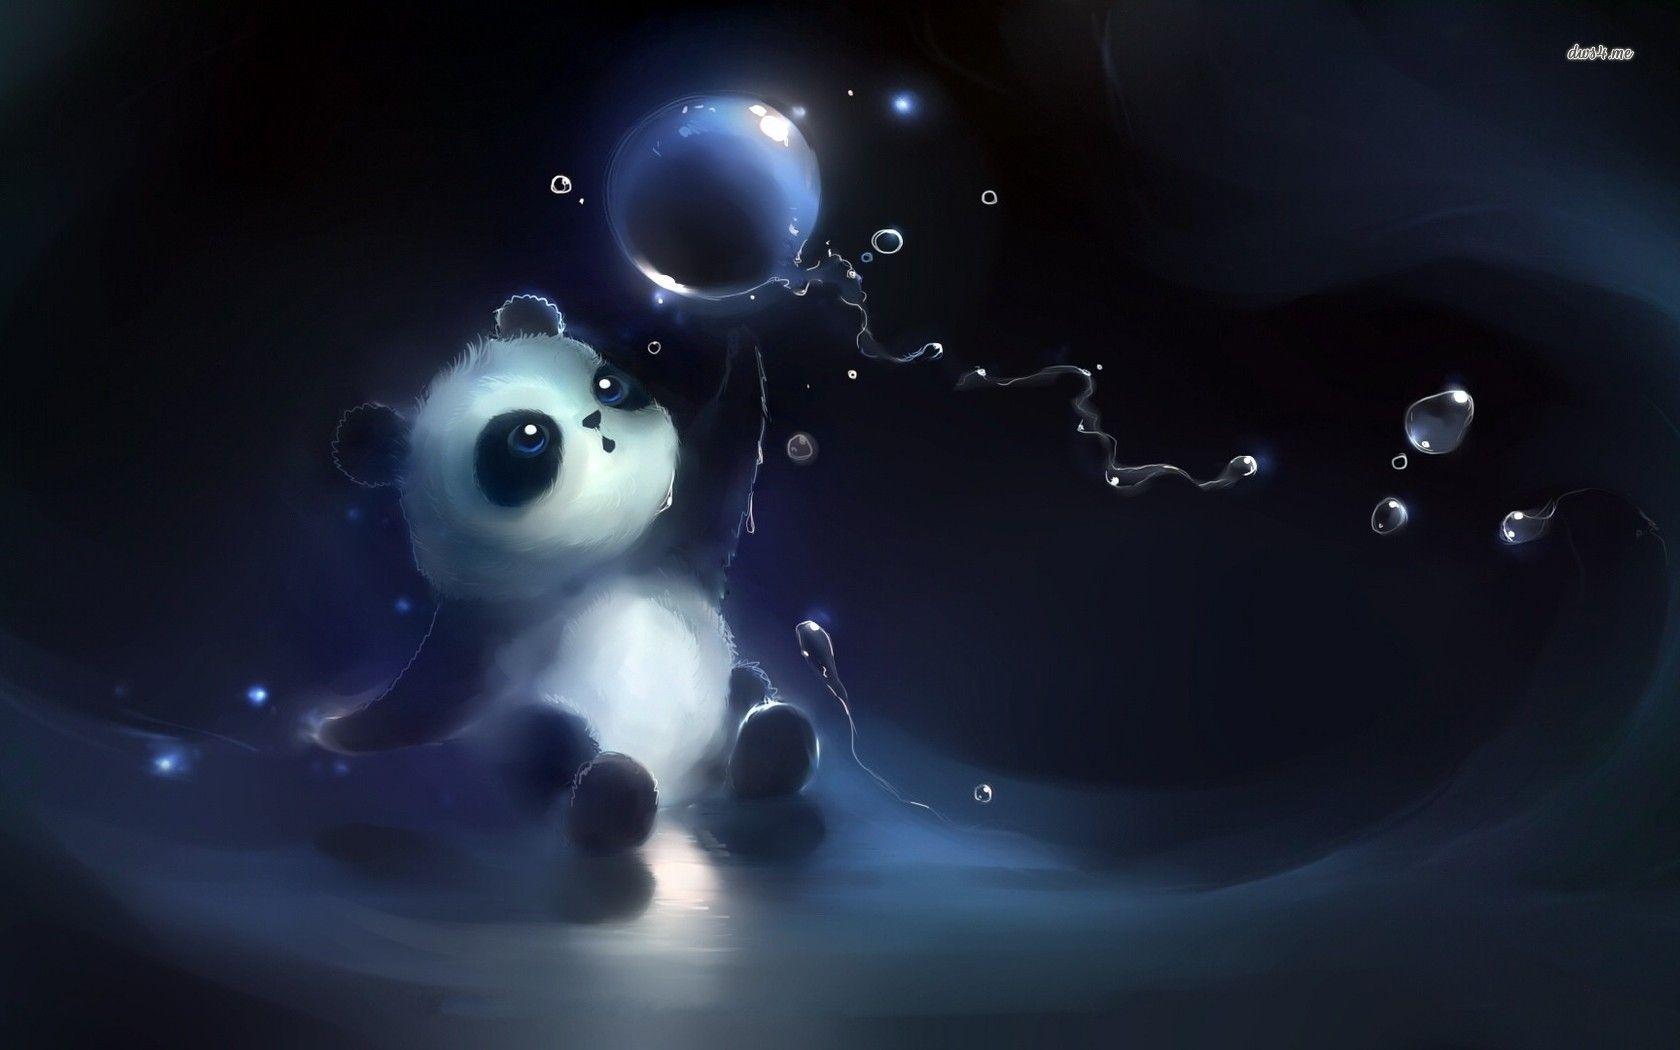 baby panda wallpapers wallpaper | hd wallpapers | pinterest | wallpaper